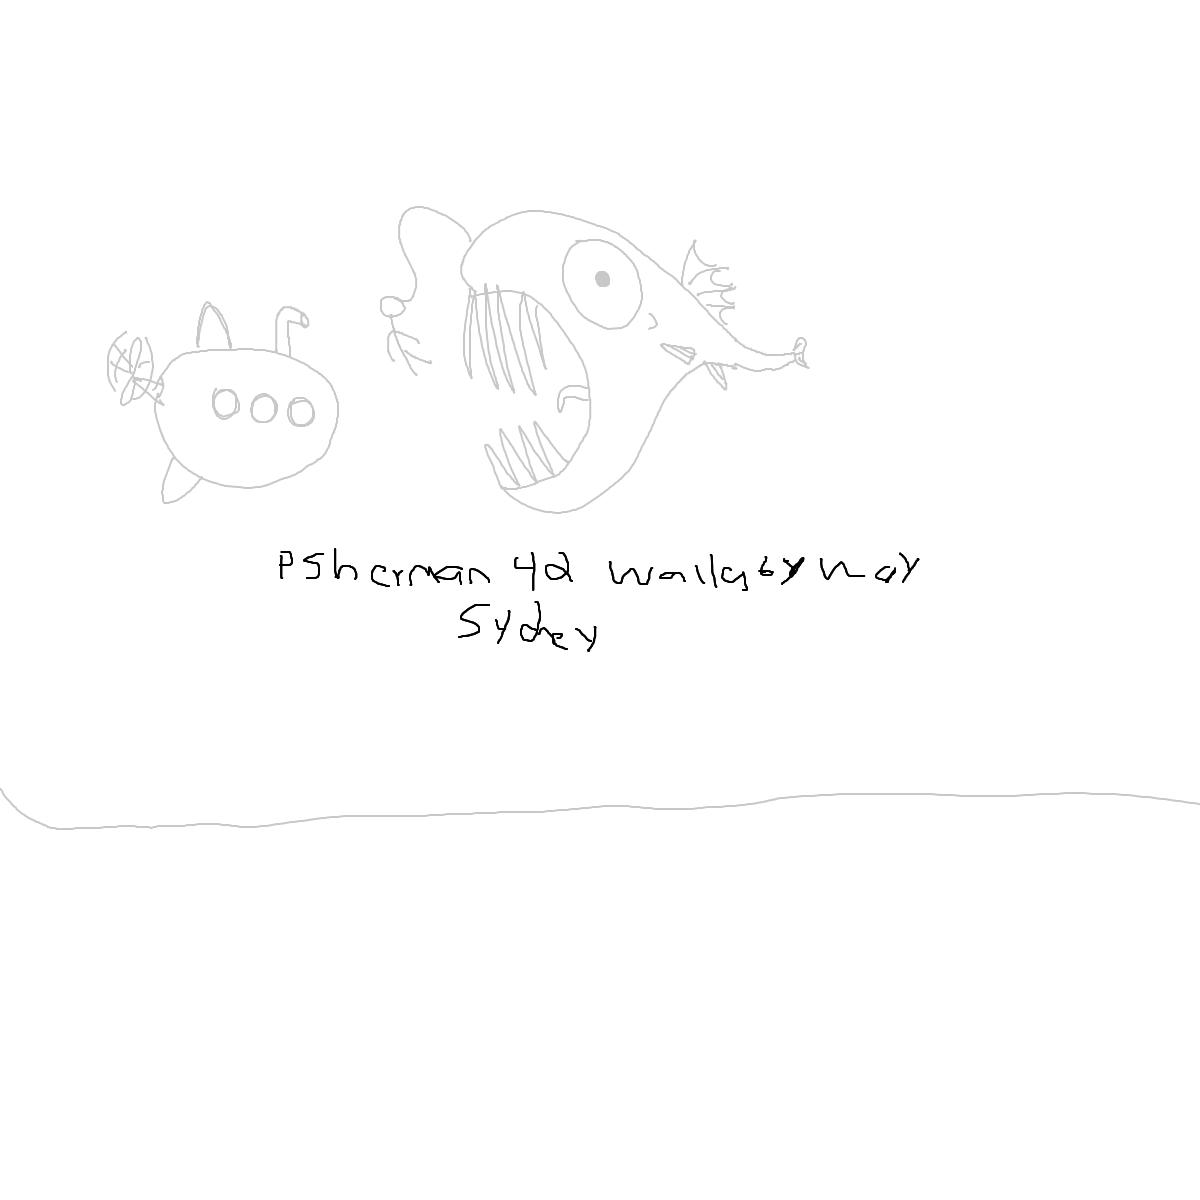 BAAAM drawing#5105 lat:42.2381553649902340lng: -70.1751174926757800